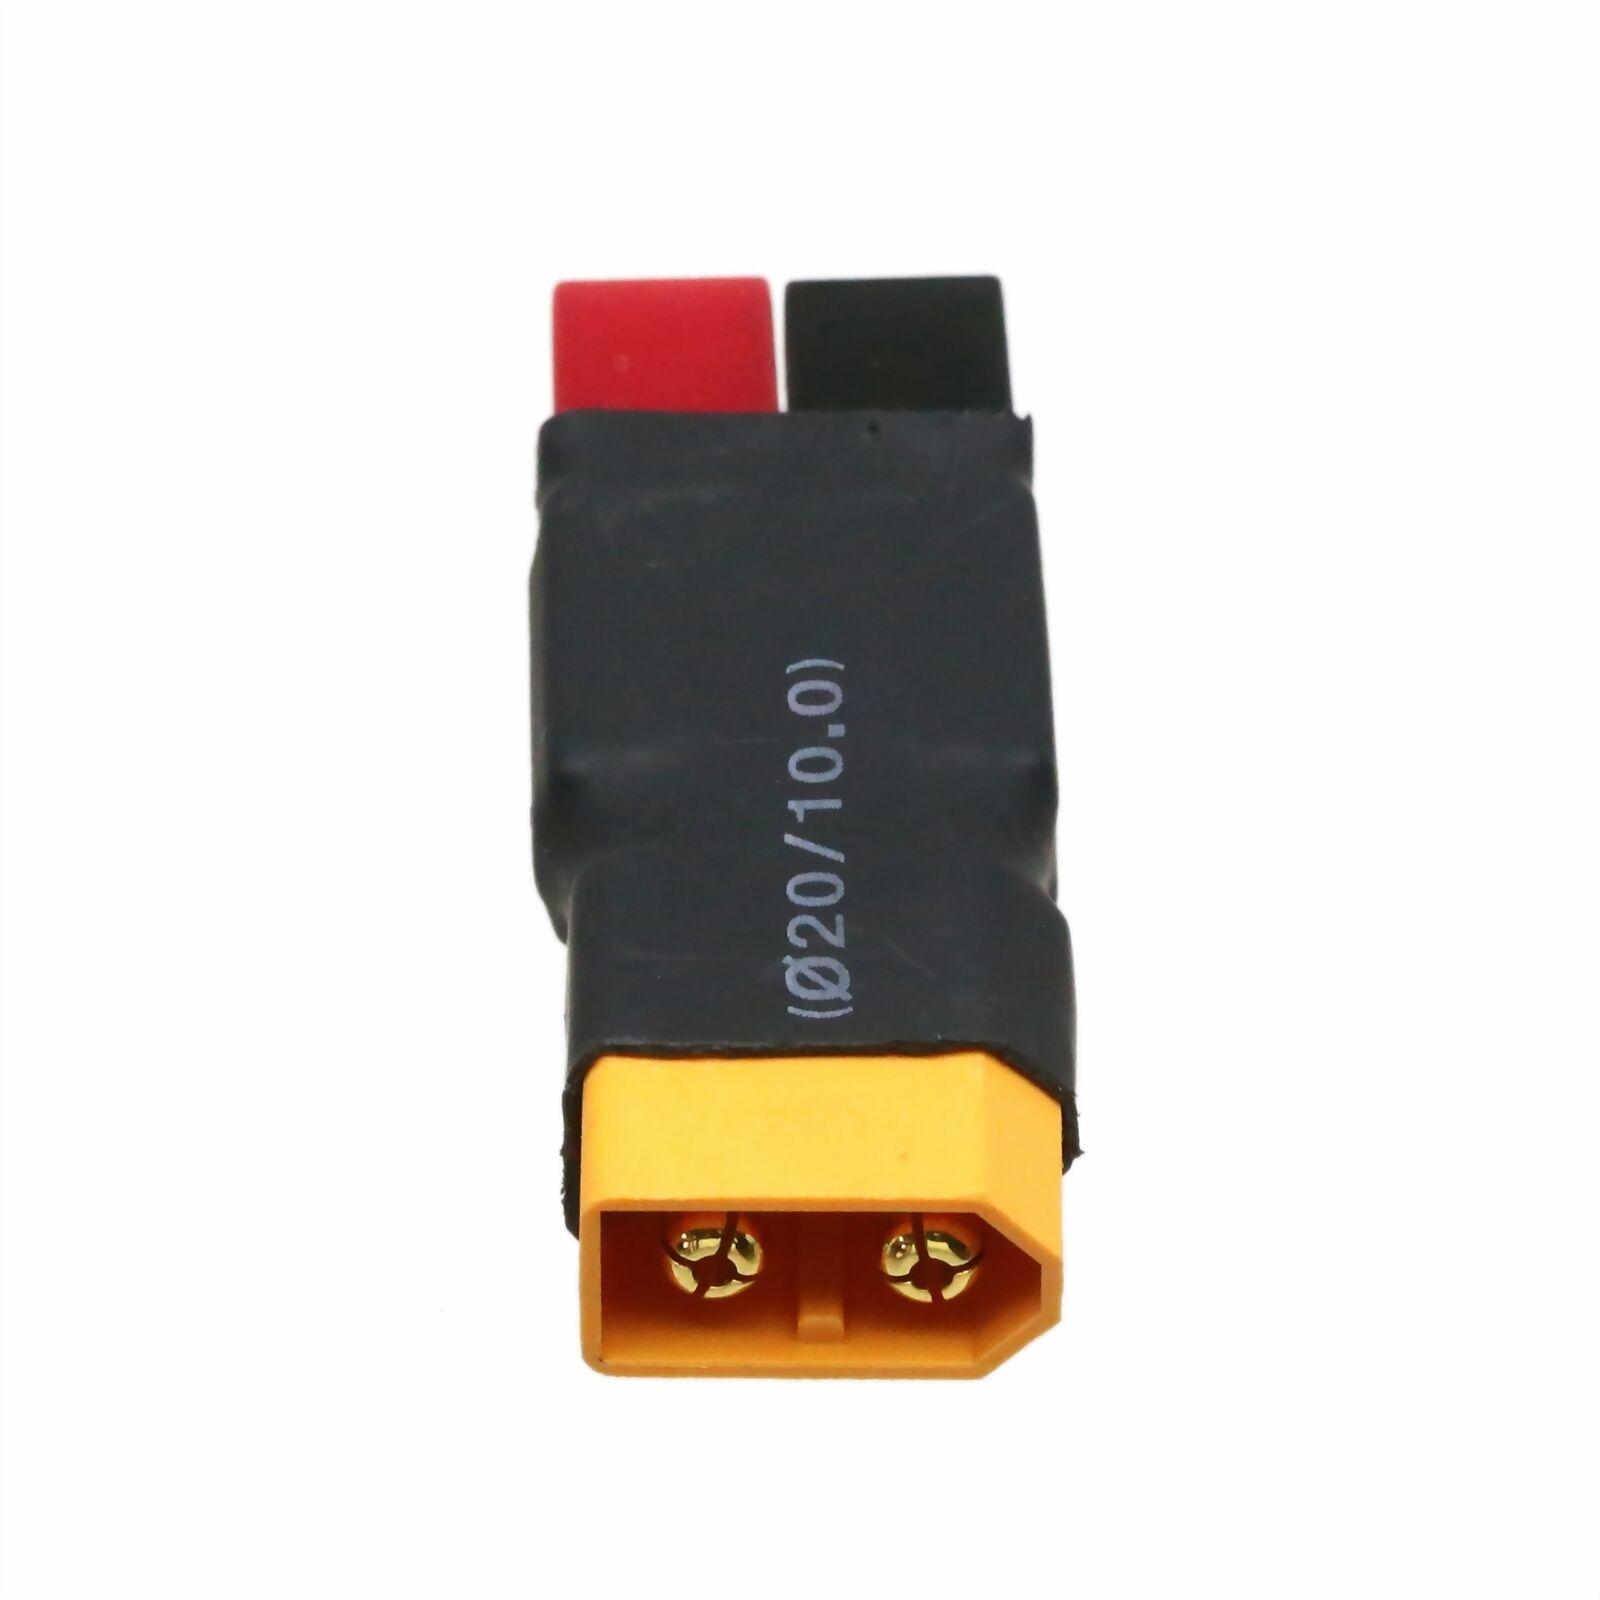 DC Power 45A 45Amps to XT60 Male Adapter charging Radio YAESU ICOM KENWOOD Volt